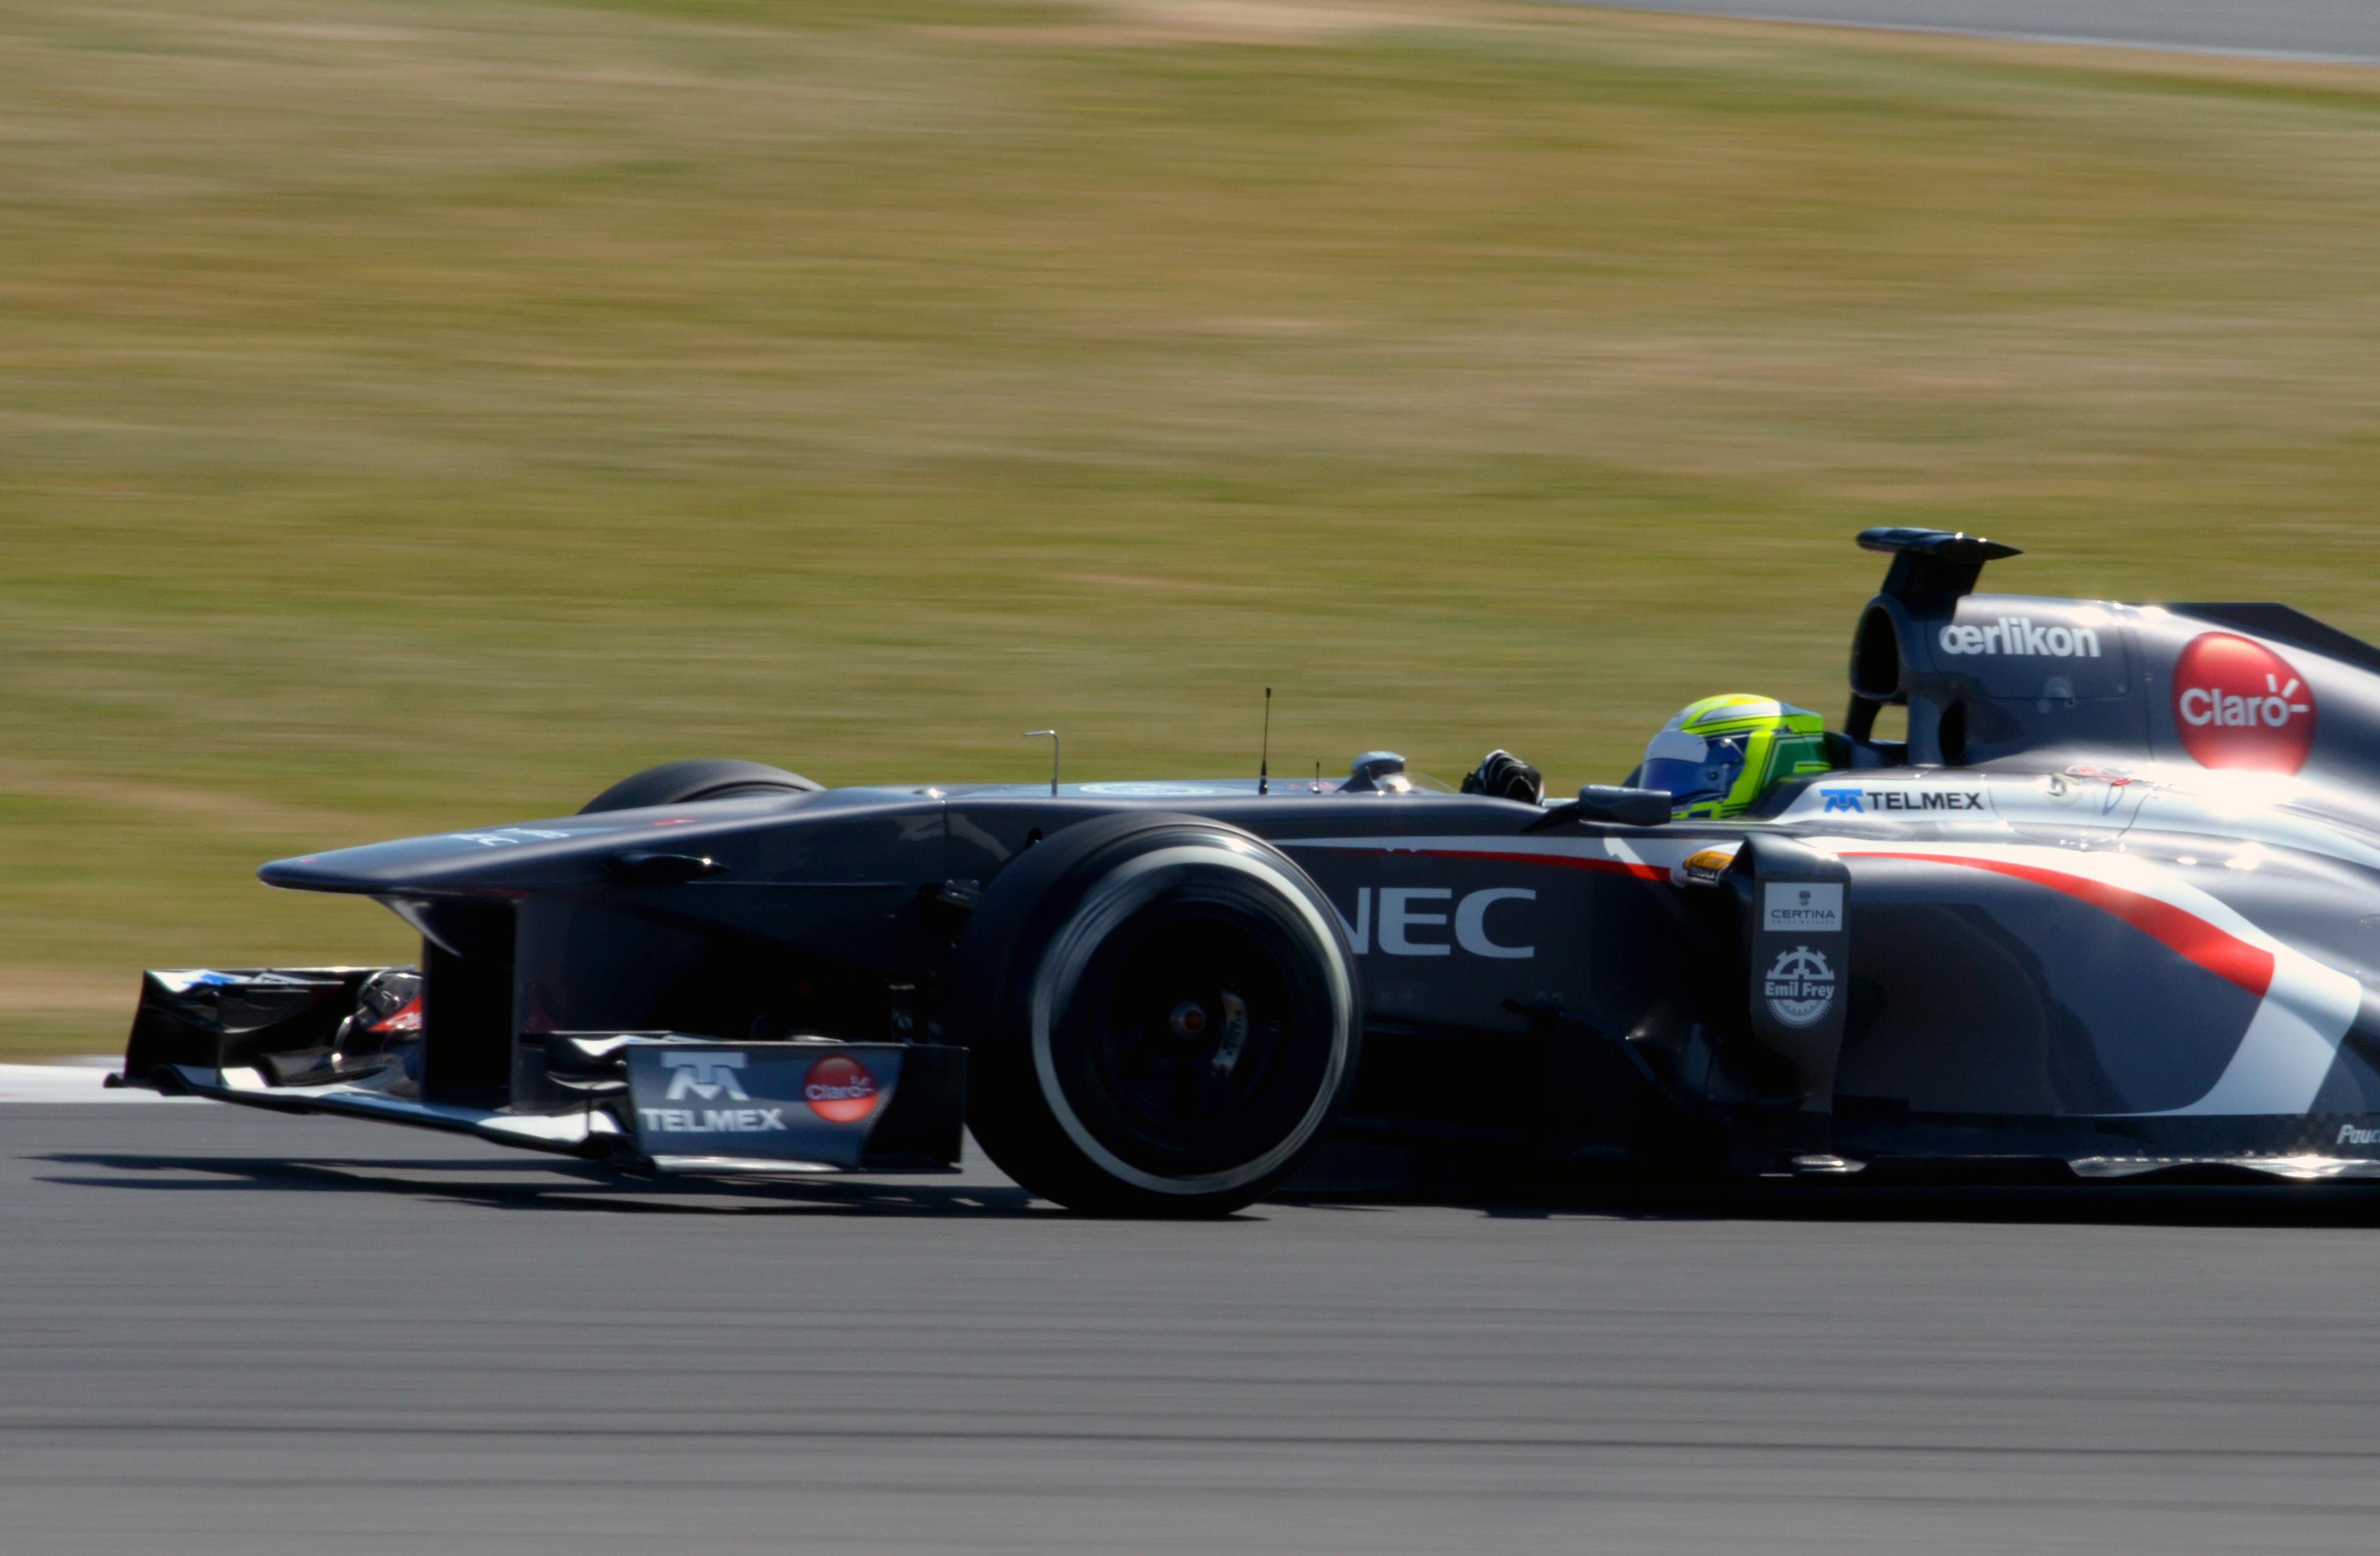 File:Kimiya Sato Sauber 2013 Silverstone F1 Test 001.jpg - W